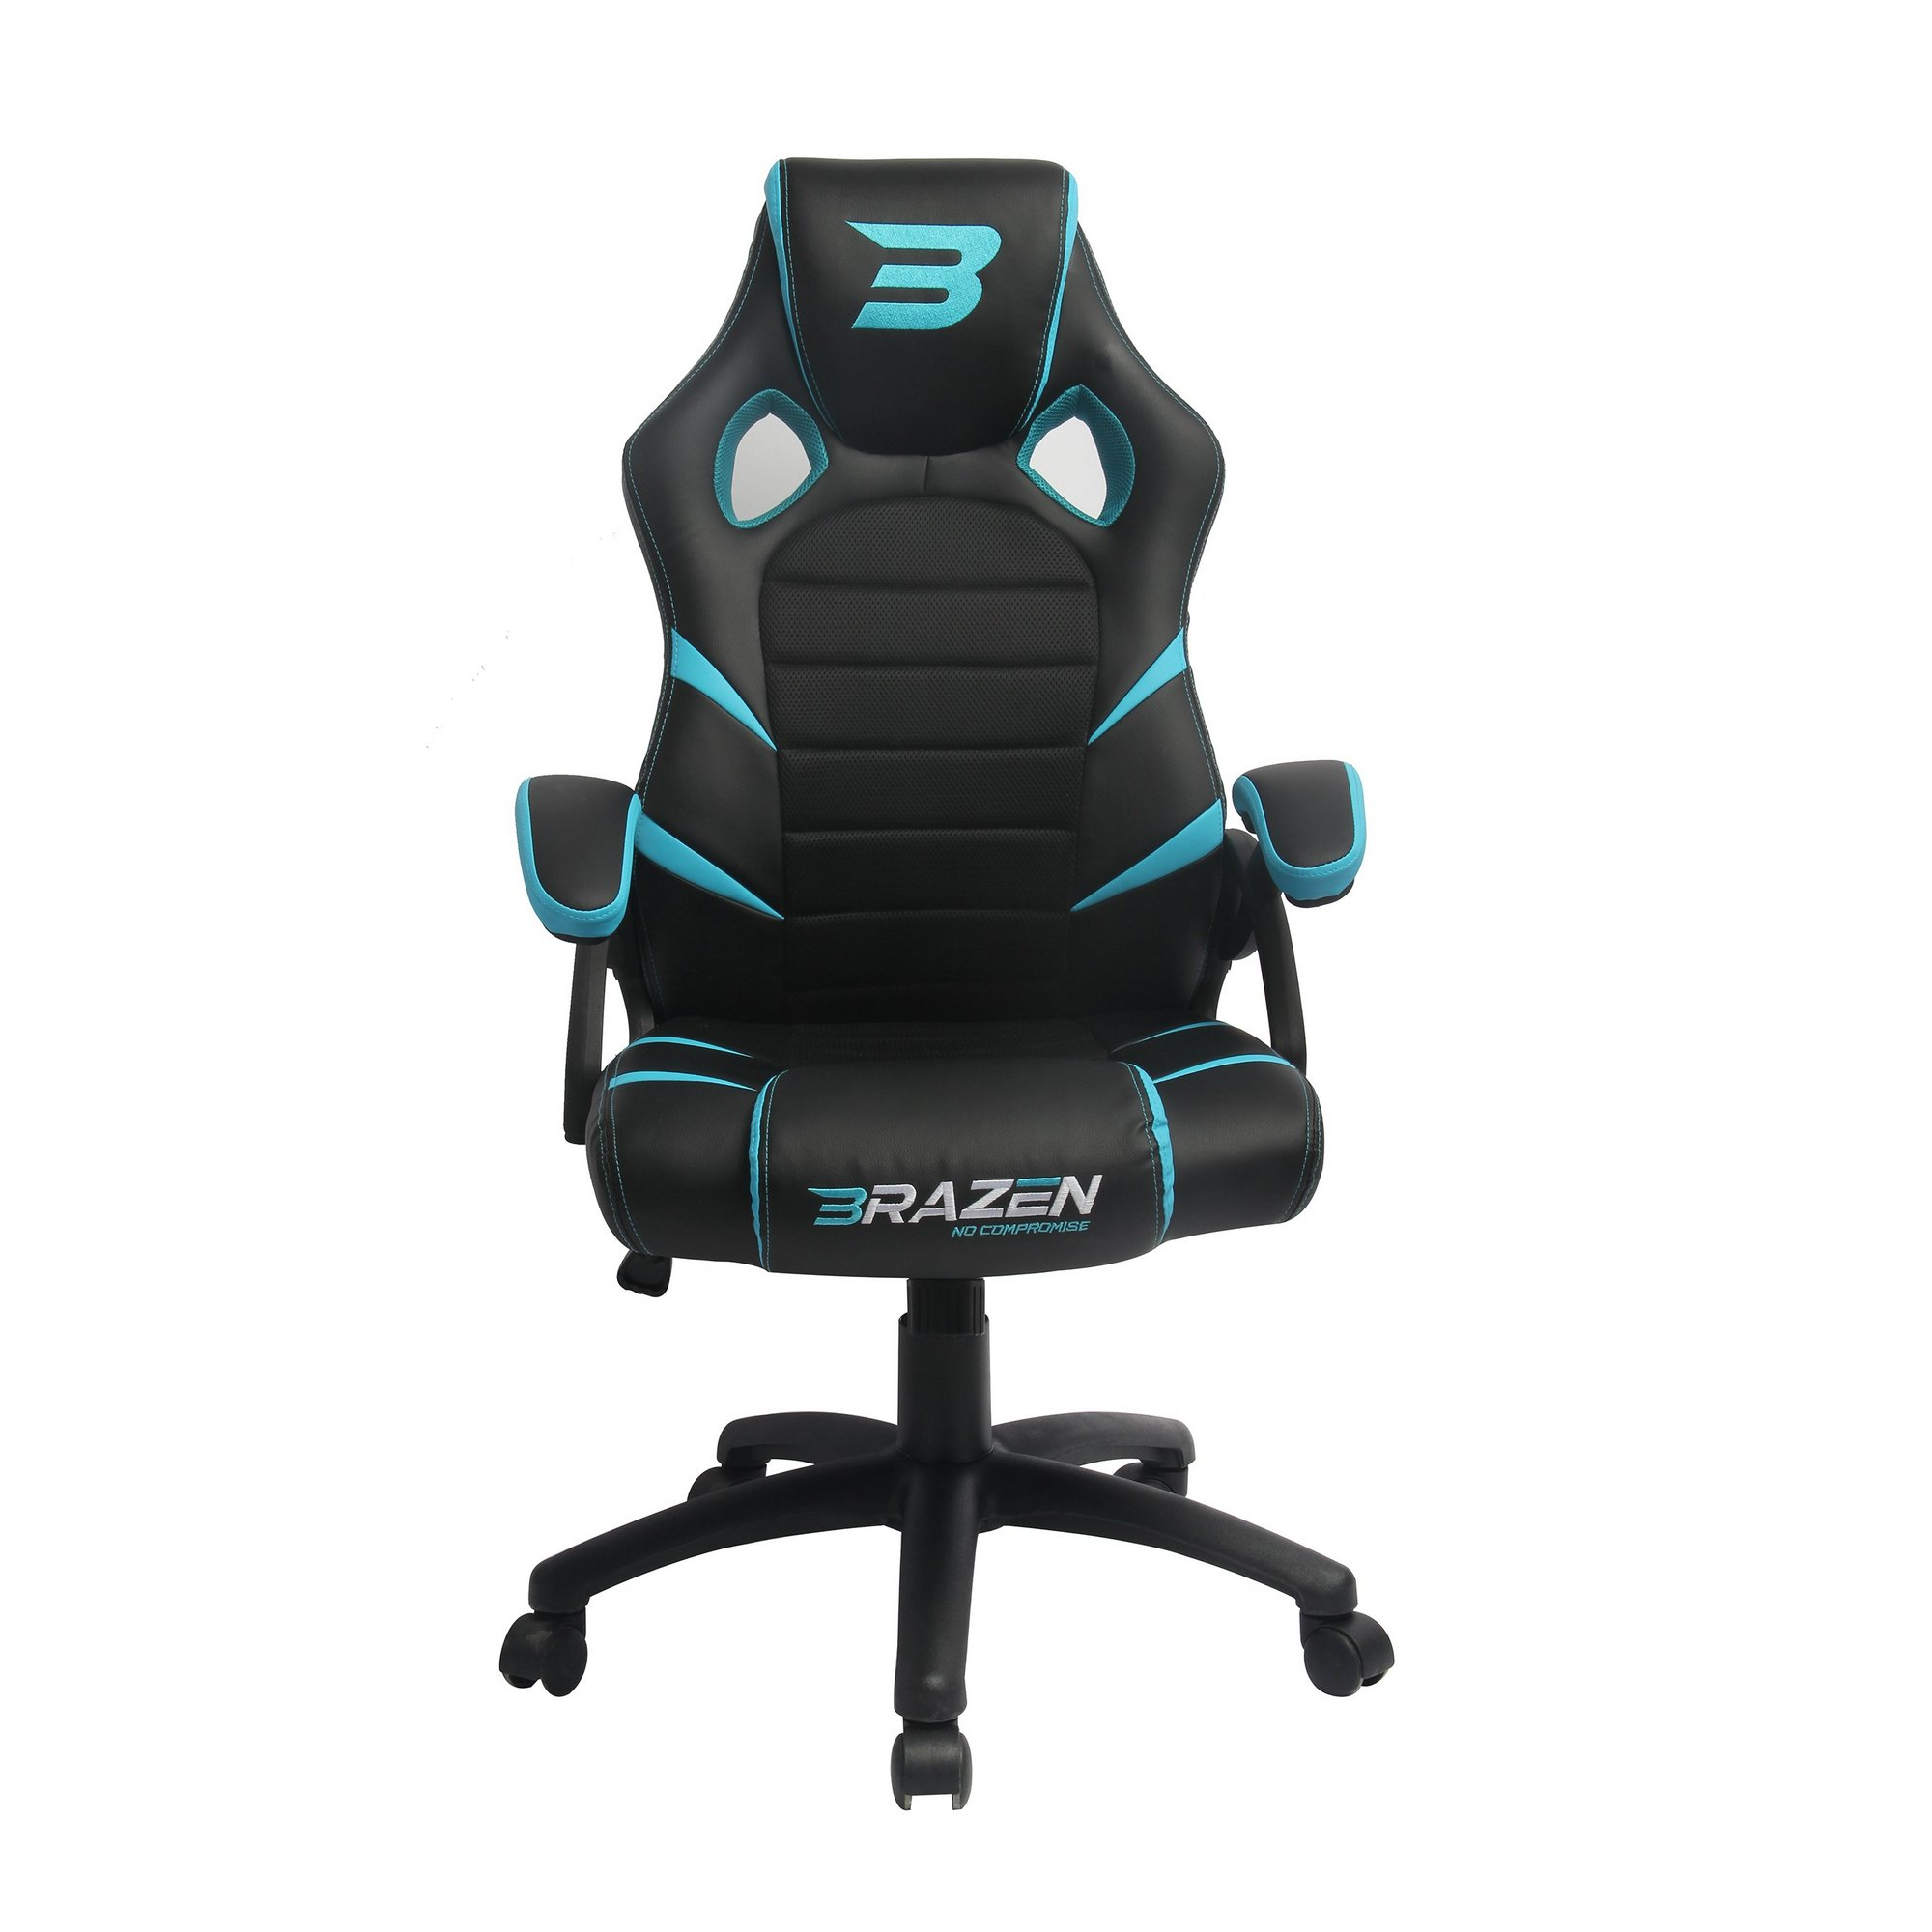 Image of BraZen Puma Gaming Chair